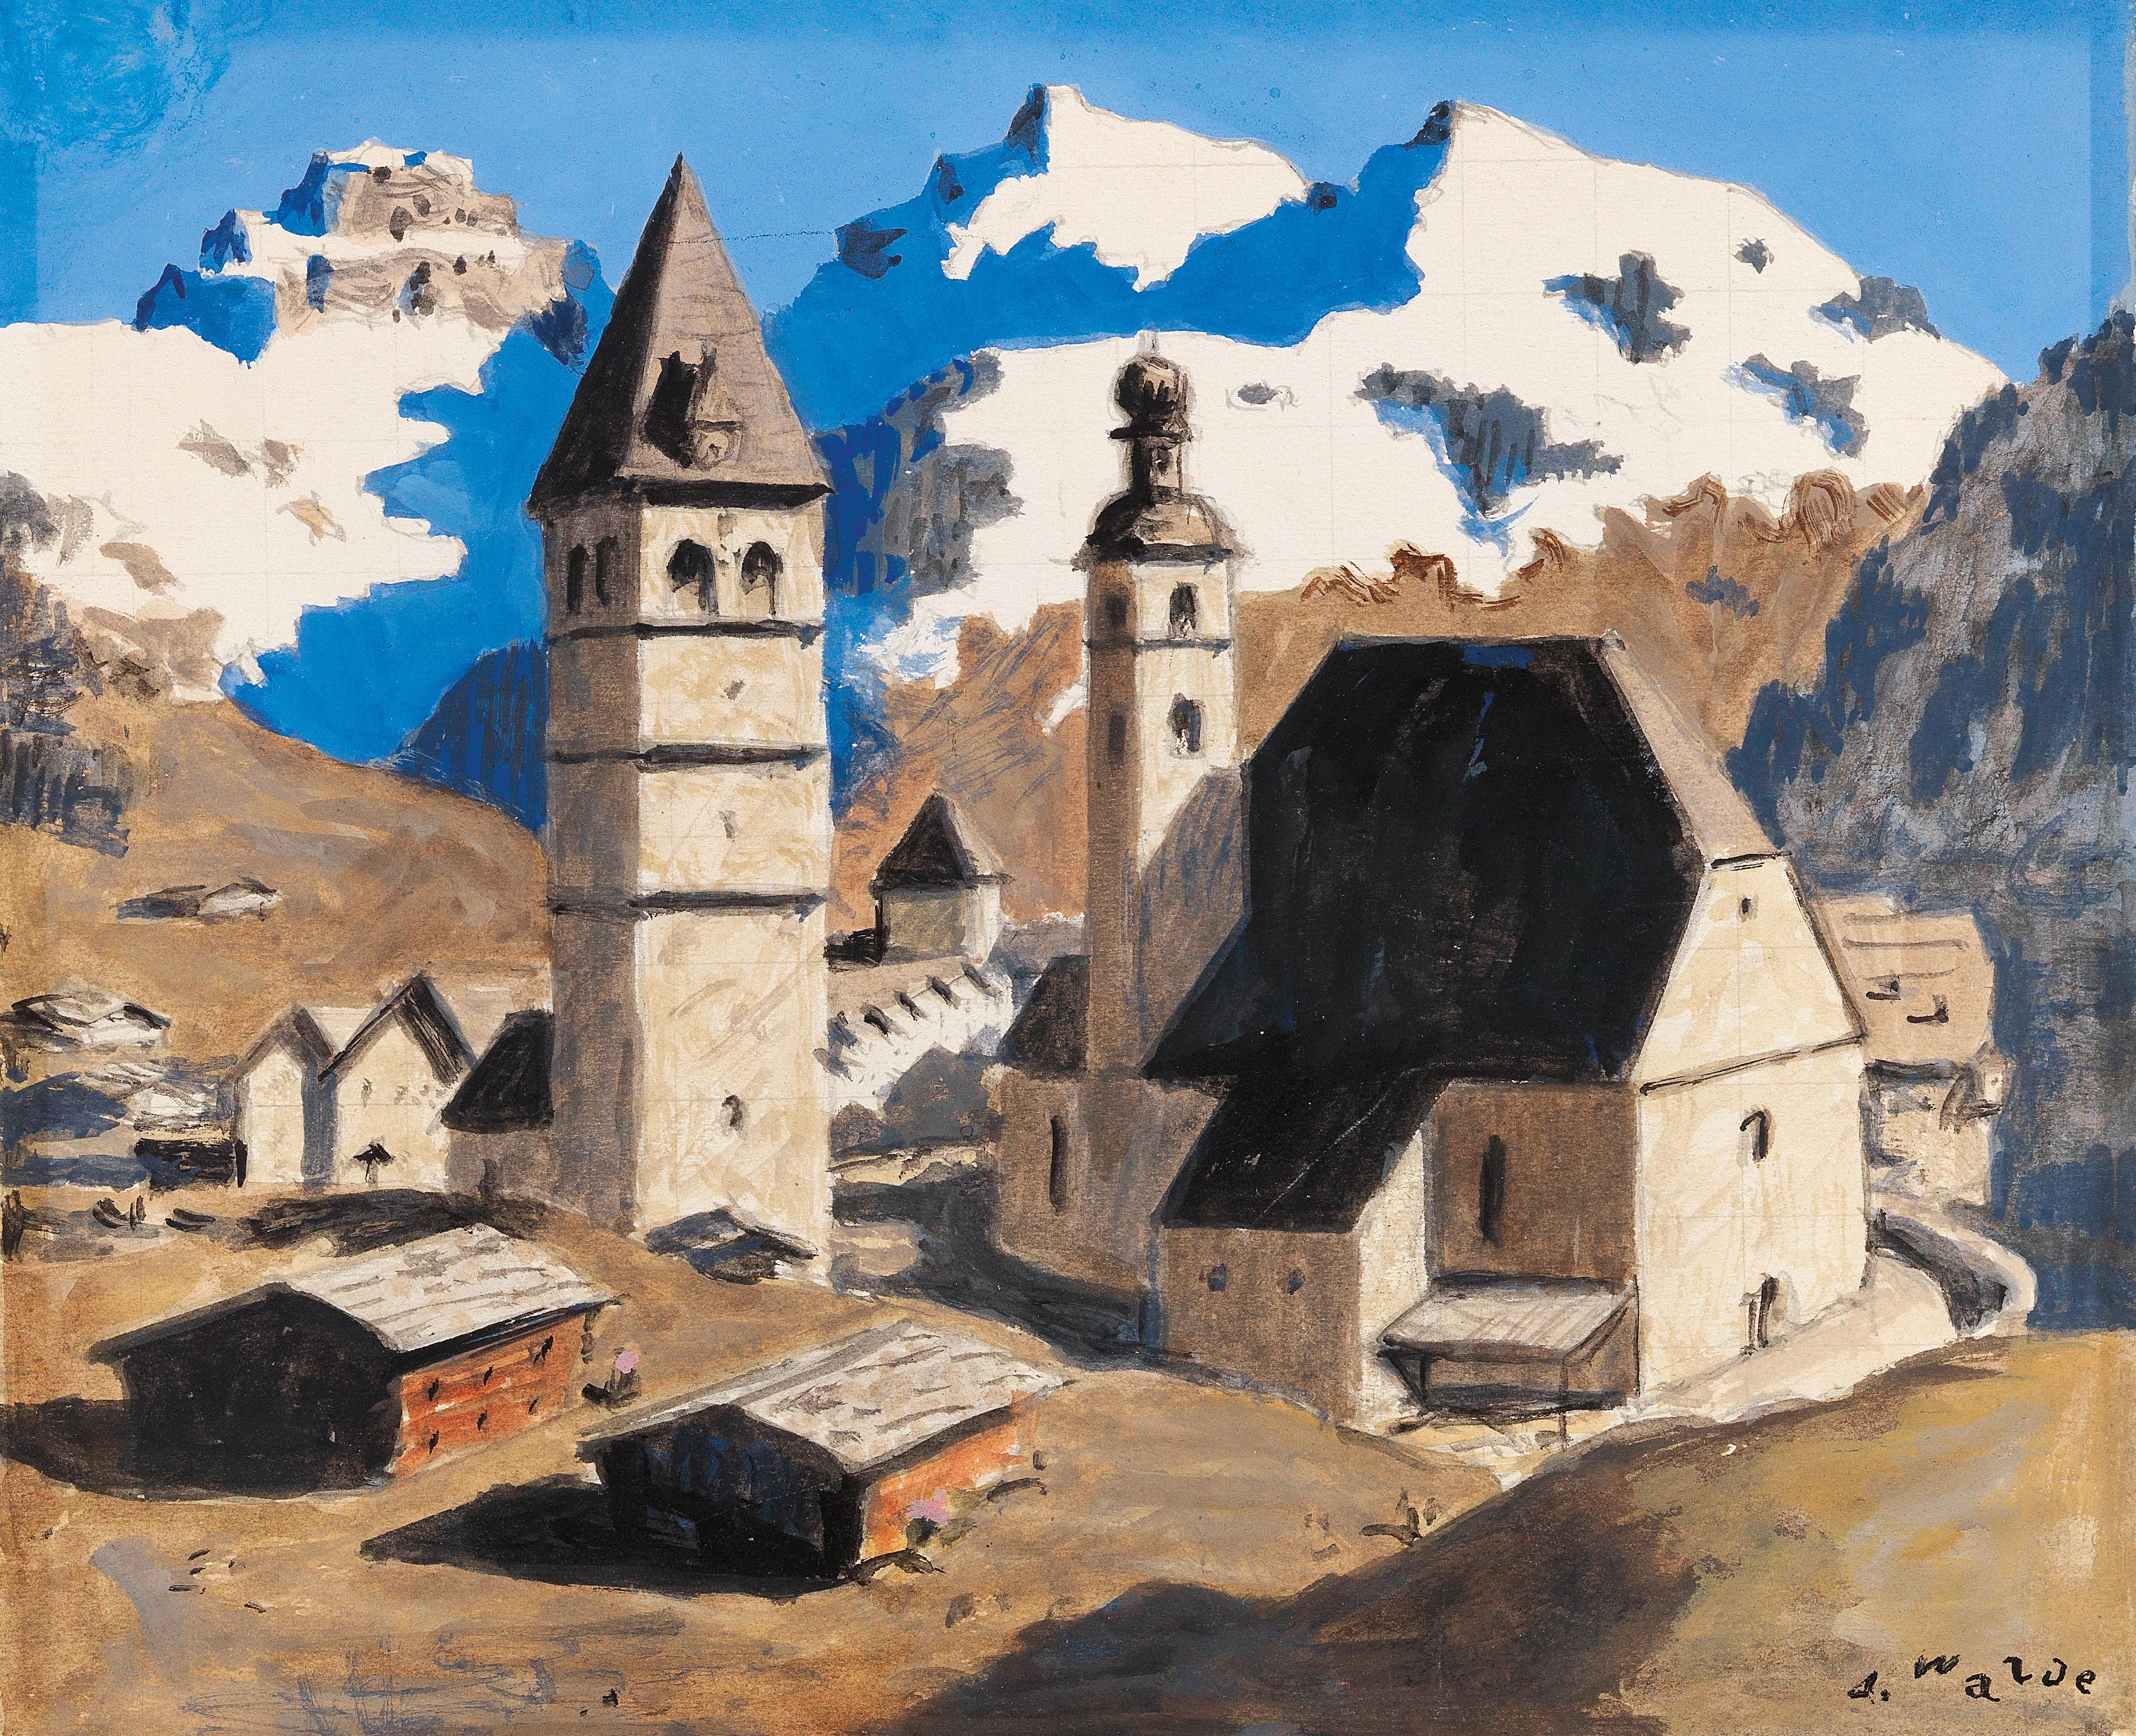 Alfons Walde (Oberndorf 1891–1958 Kitzbühel) Kitzbühel in spring, signed A. Walde, tempera, gouache, pencil on paper